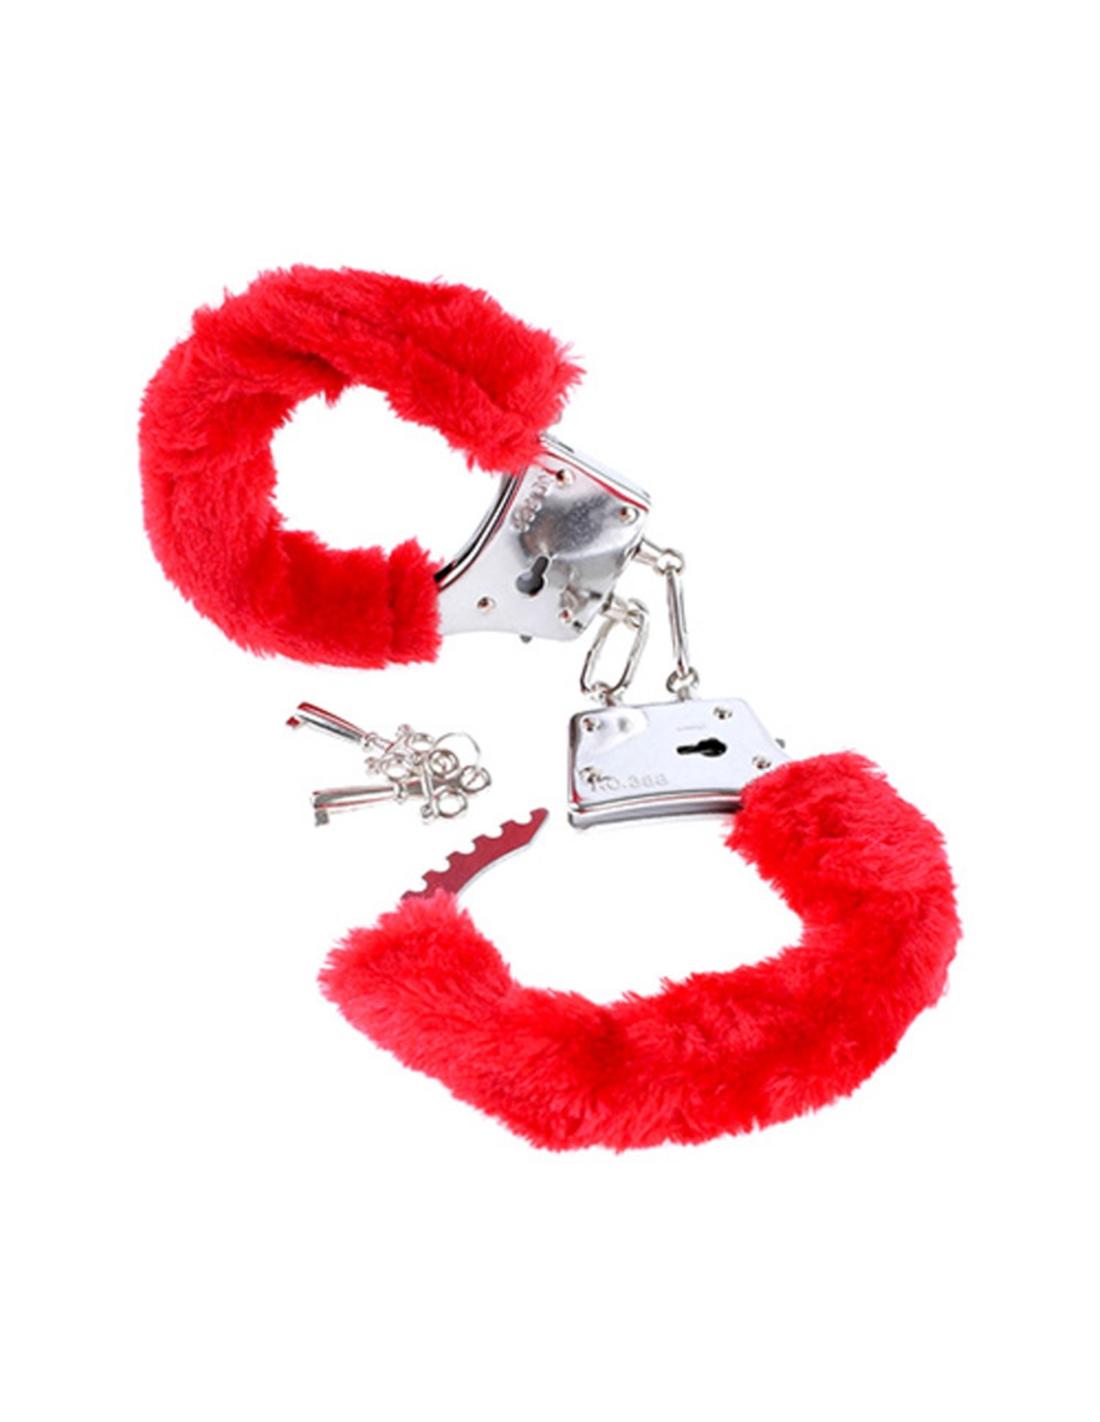 Algemas Beginners Furry Cuffs Fetish Vermelho - PR2010311833